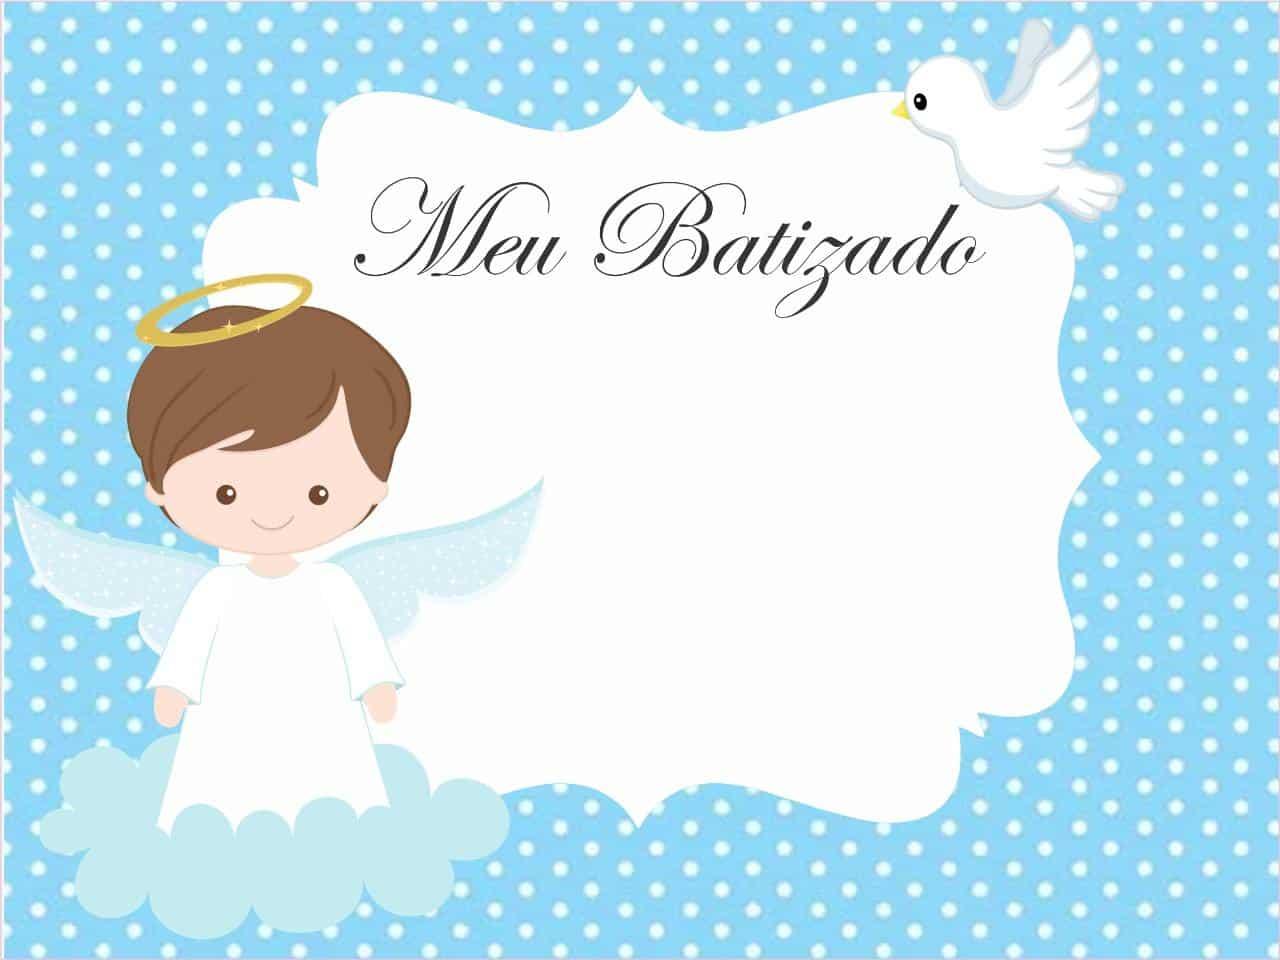 convite masculino batizado